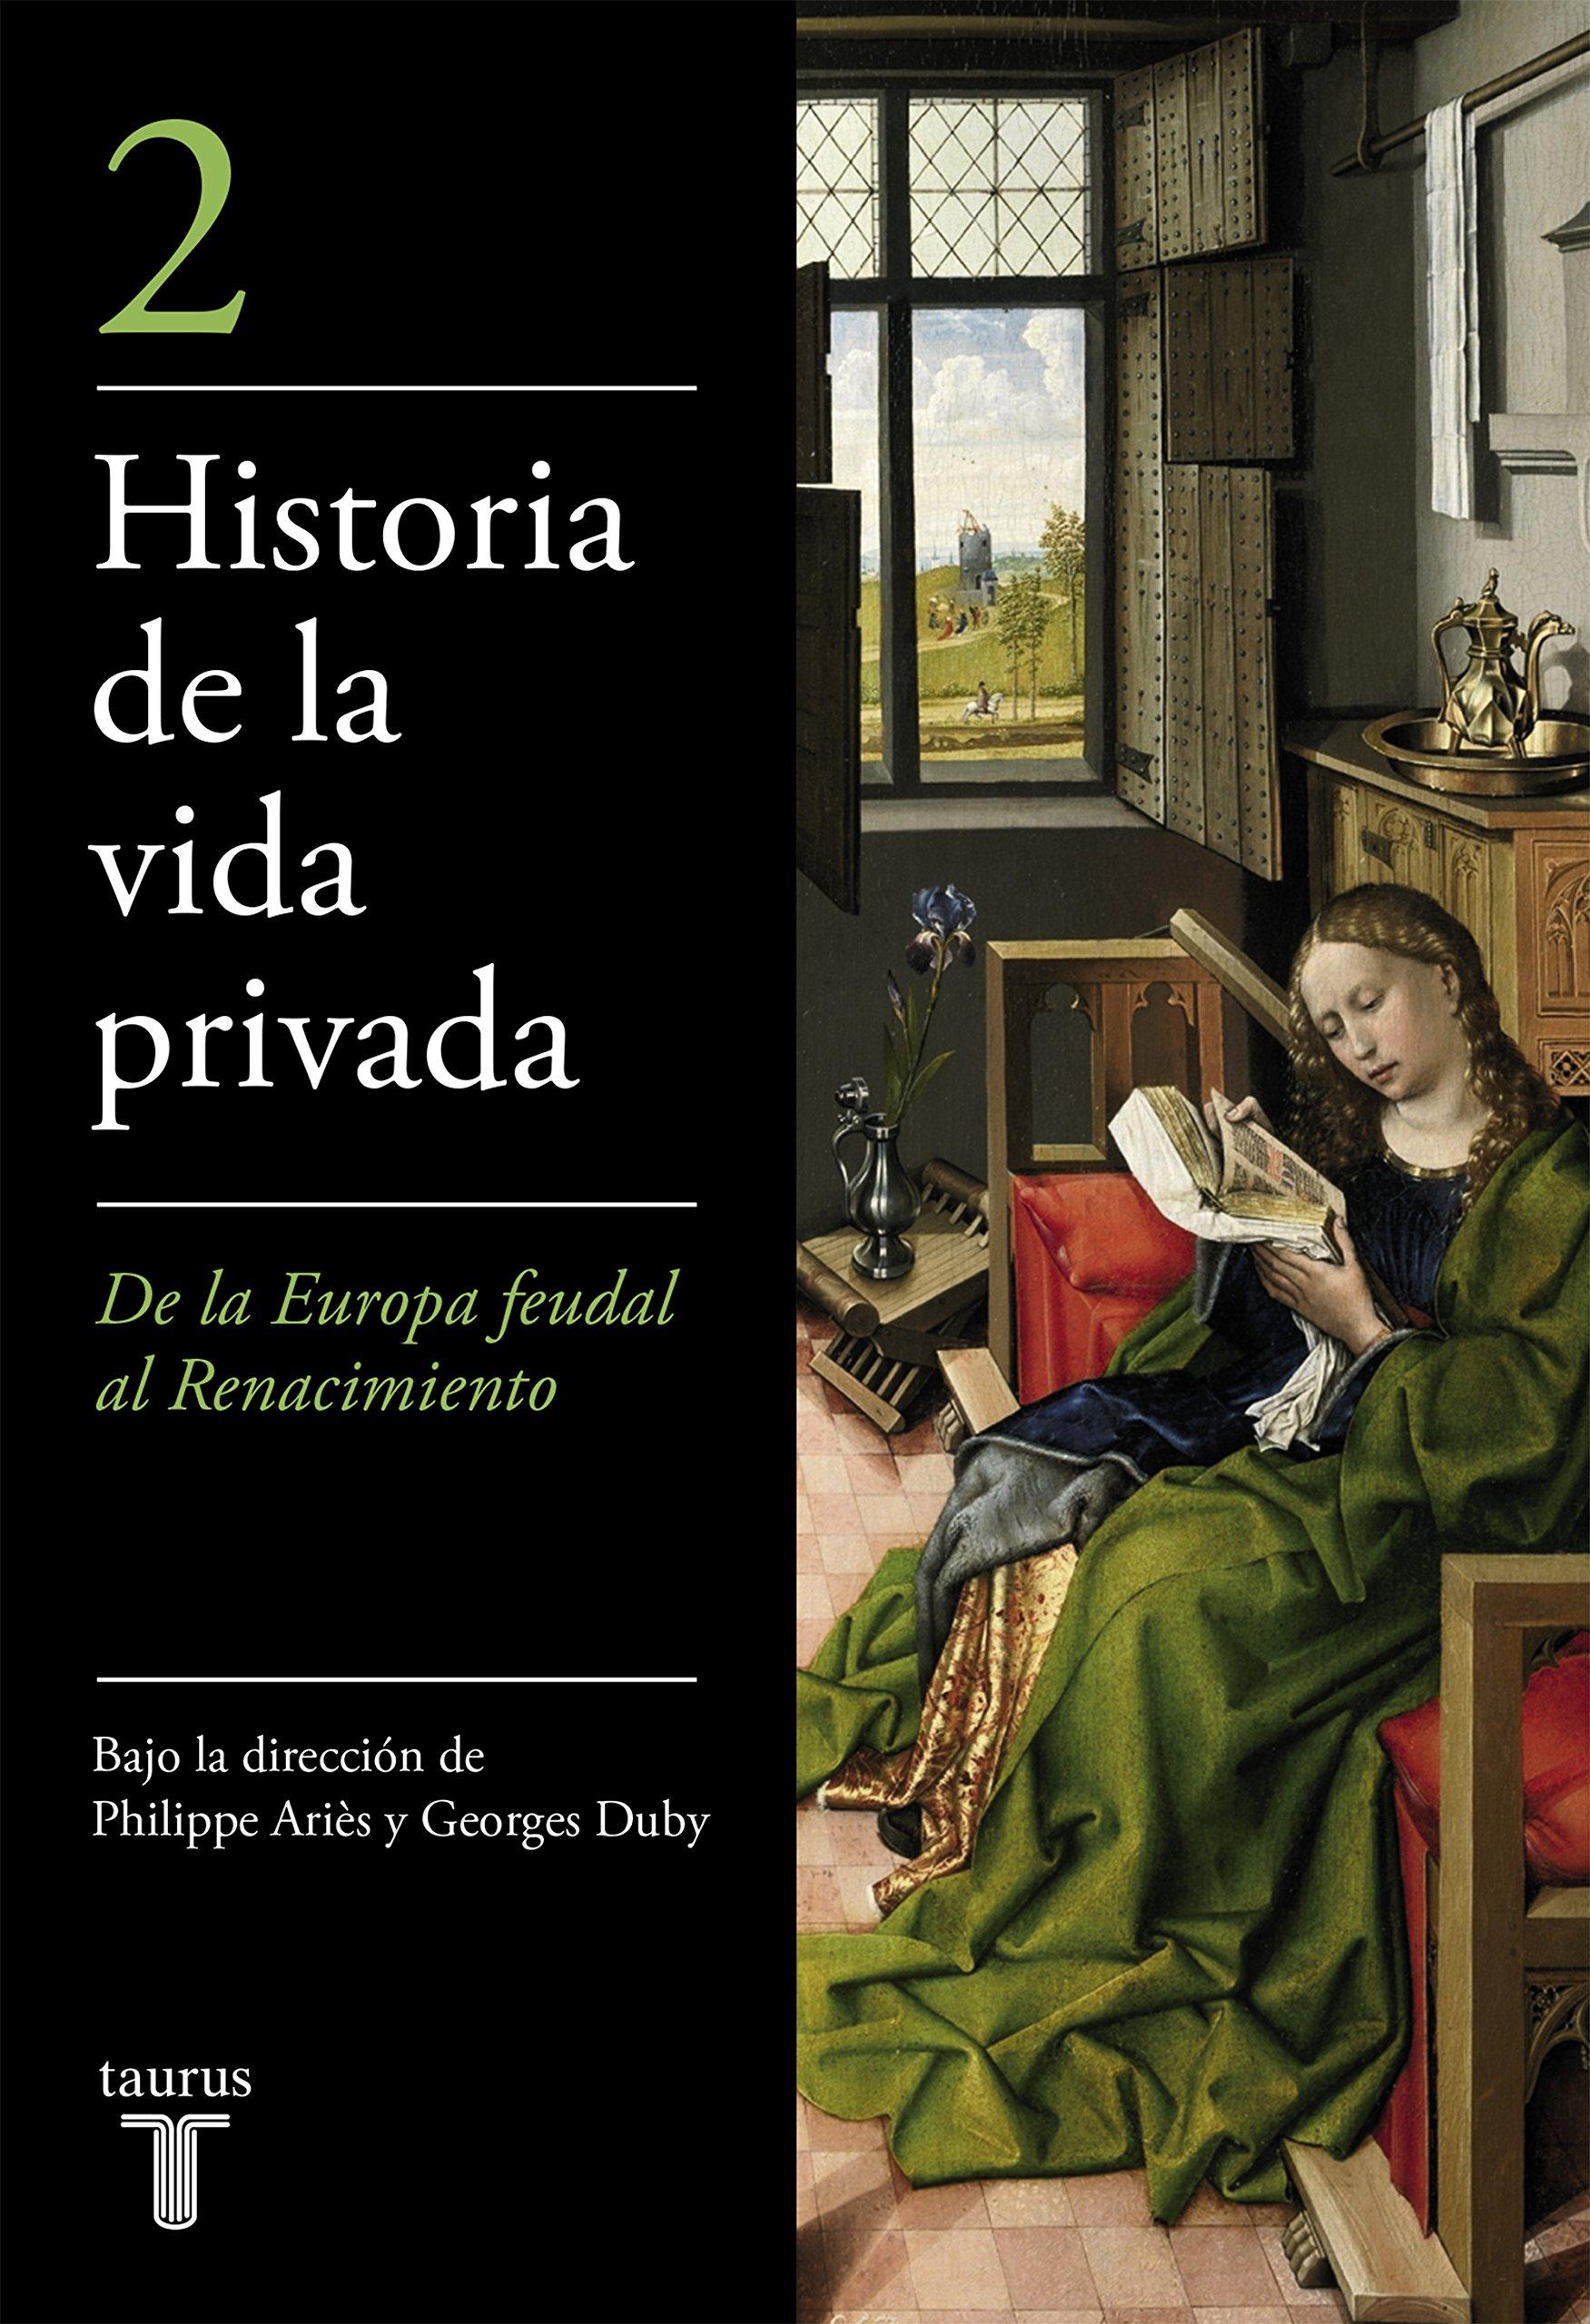 La Alta Edad Media (Historia de la vida privada)